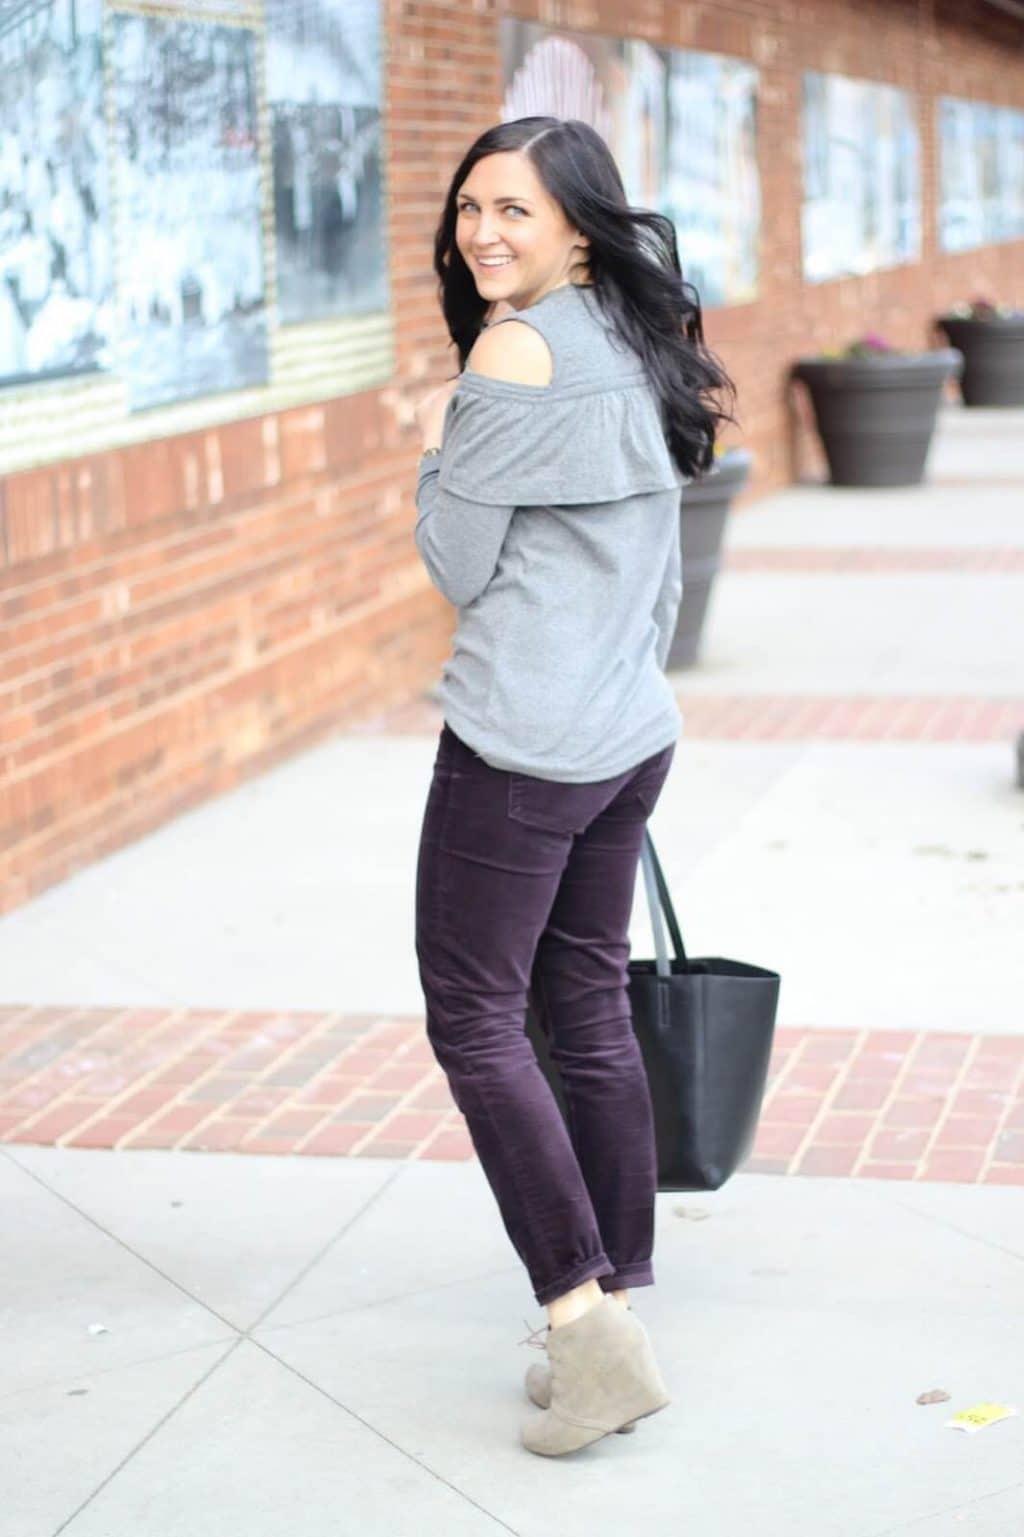 Cold Shoulder Sweatshirt with corduroy pants, wedge booties